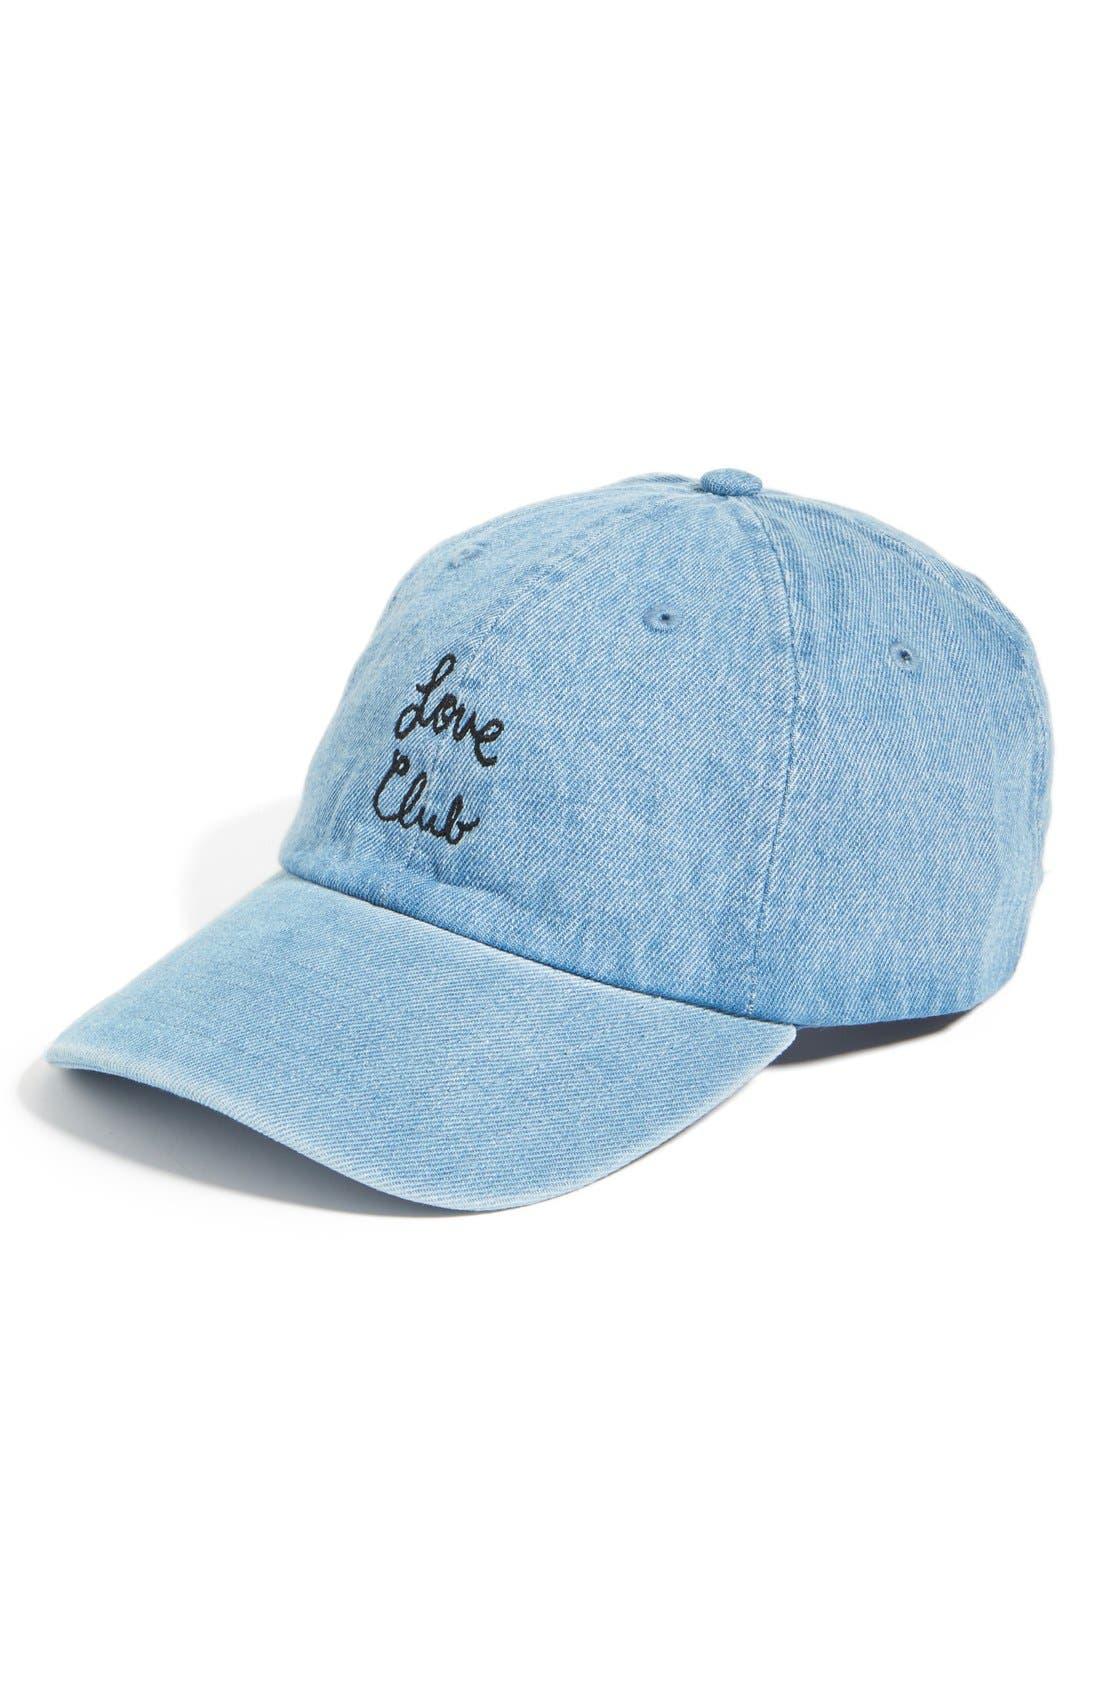 Main Image - The Style Club Love Club Baseball Cap